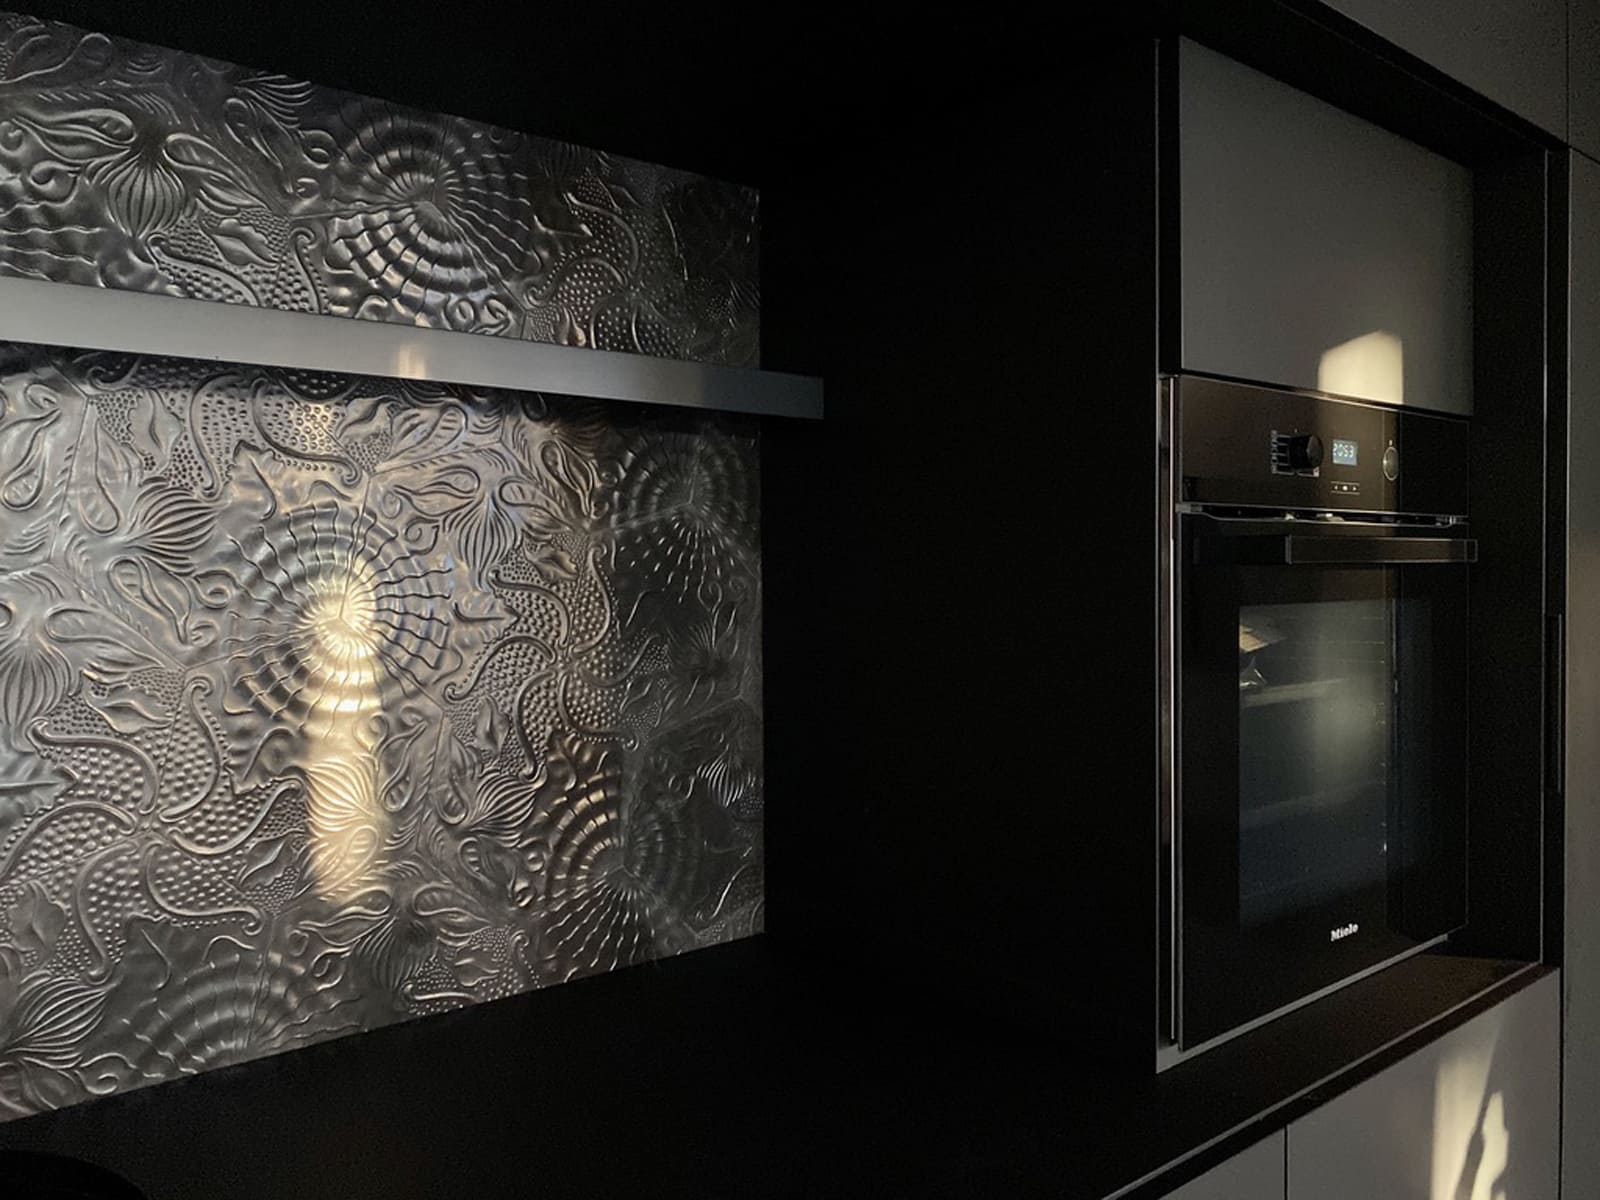 zementfliesen-terrazzofliesen-kreidefarbe-terrazzo-fugenlos-viaplatten-60G-foto-dpdesign62 | N° 60G